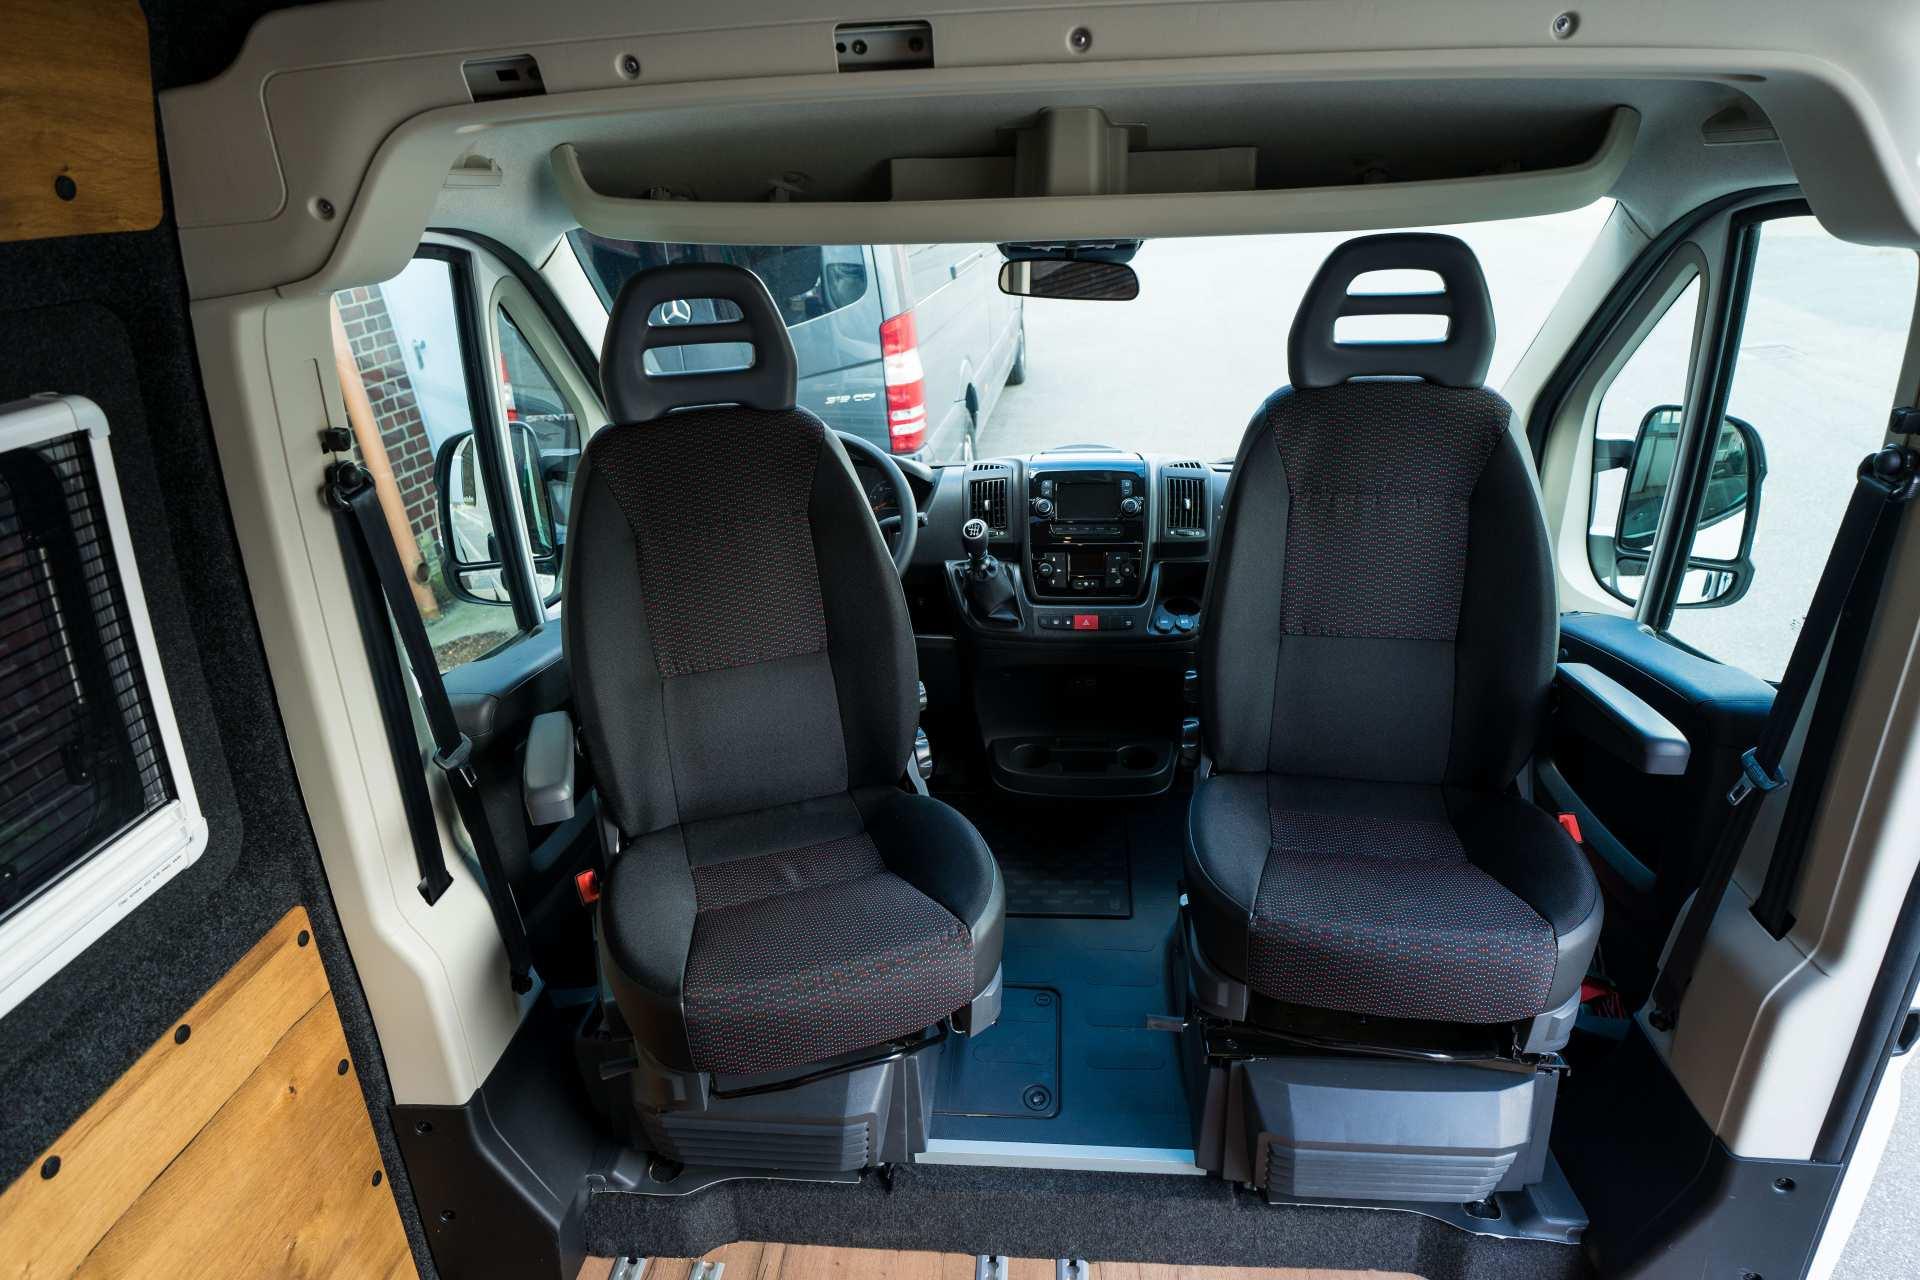 Individualausbau: Zwei-Raumwohnung Peugeot Boxer L2 H2 - 6